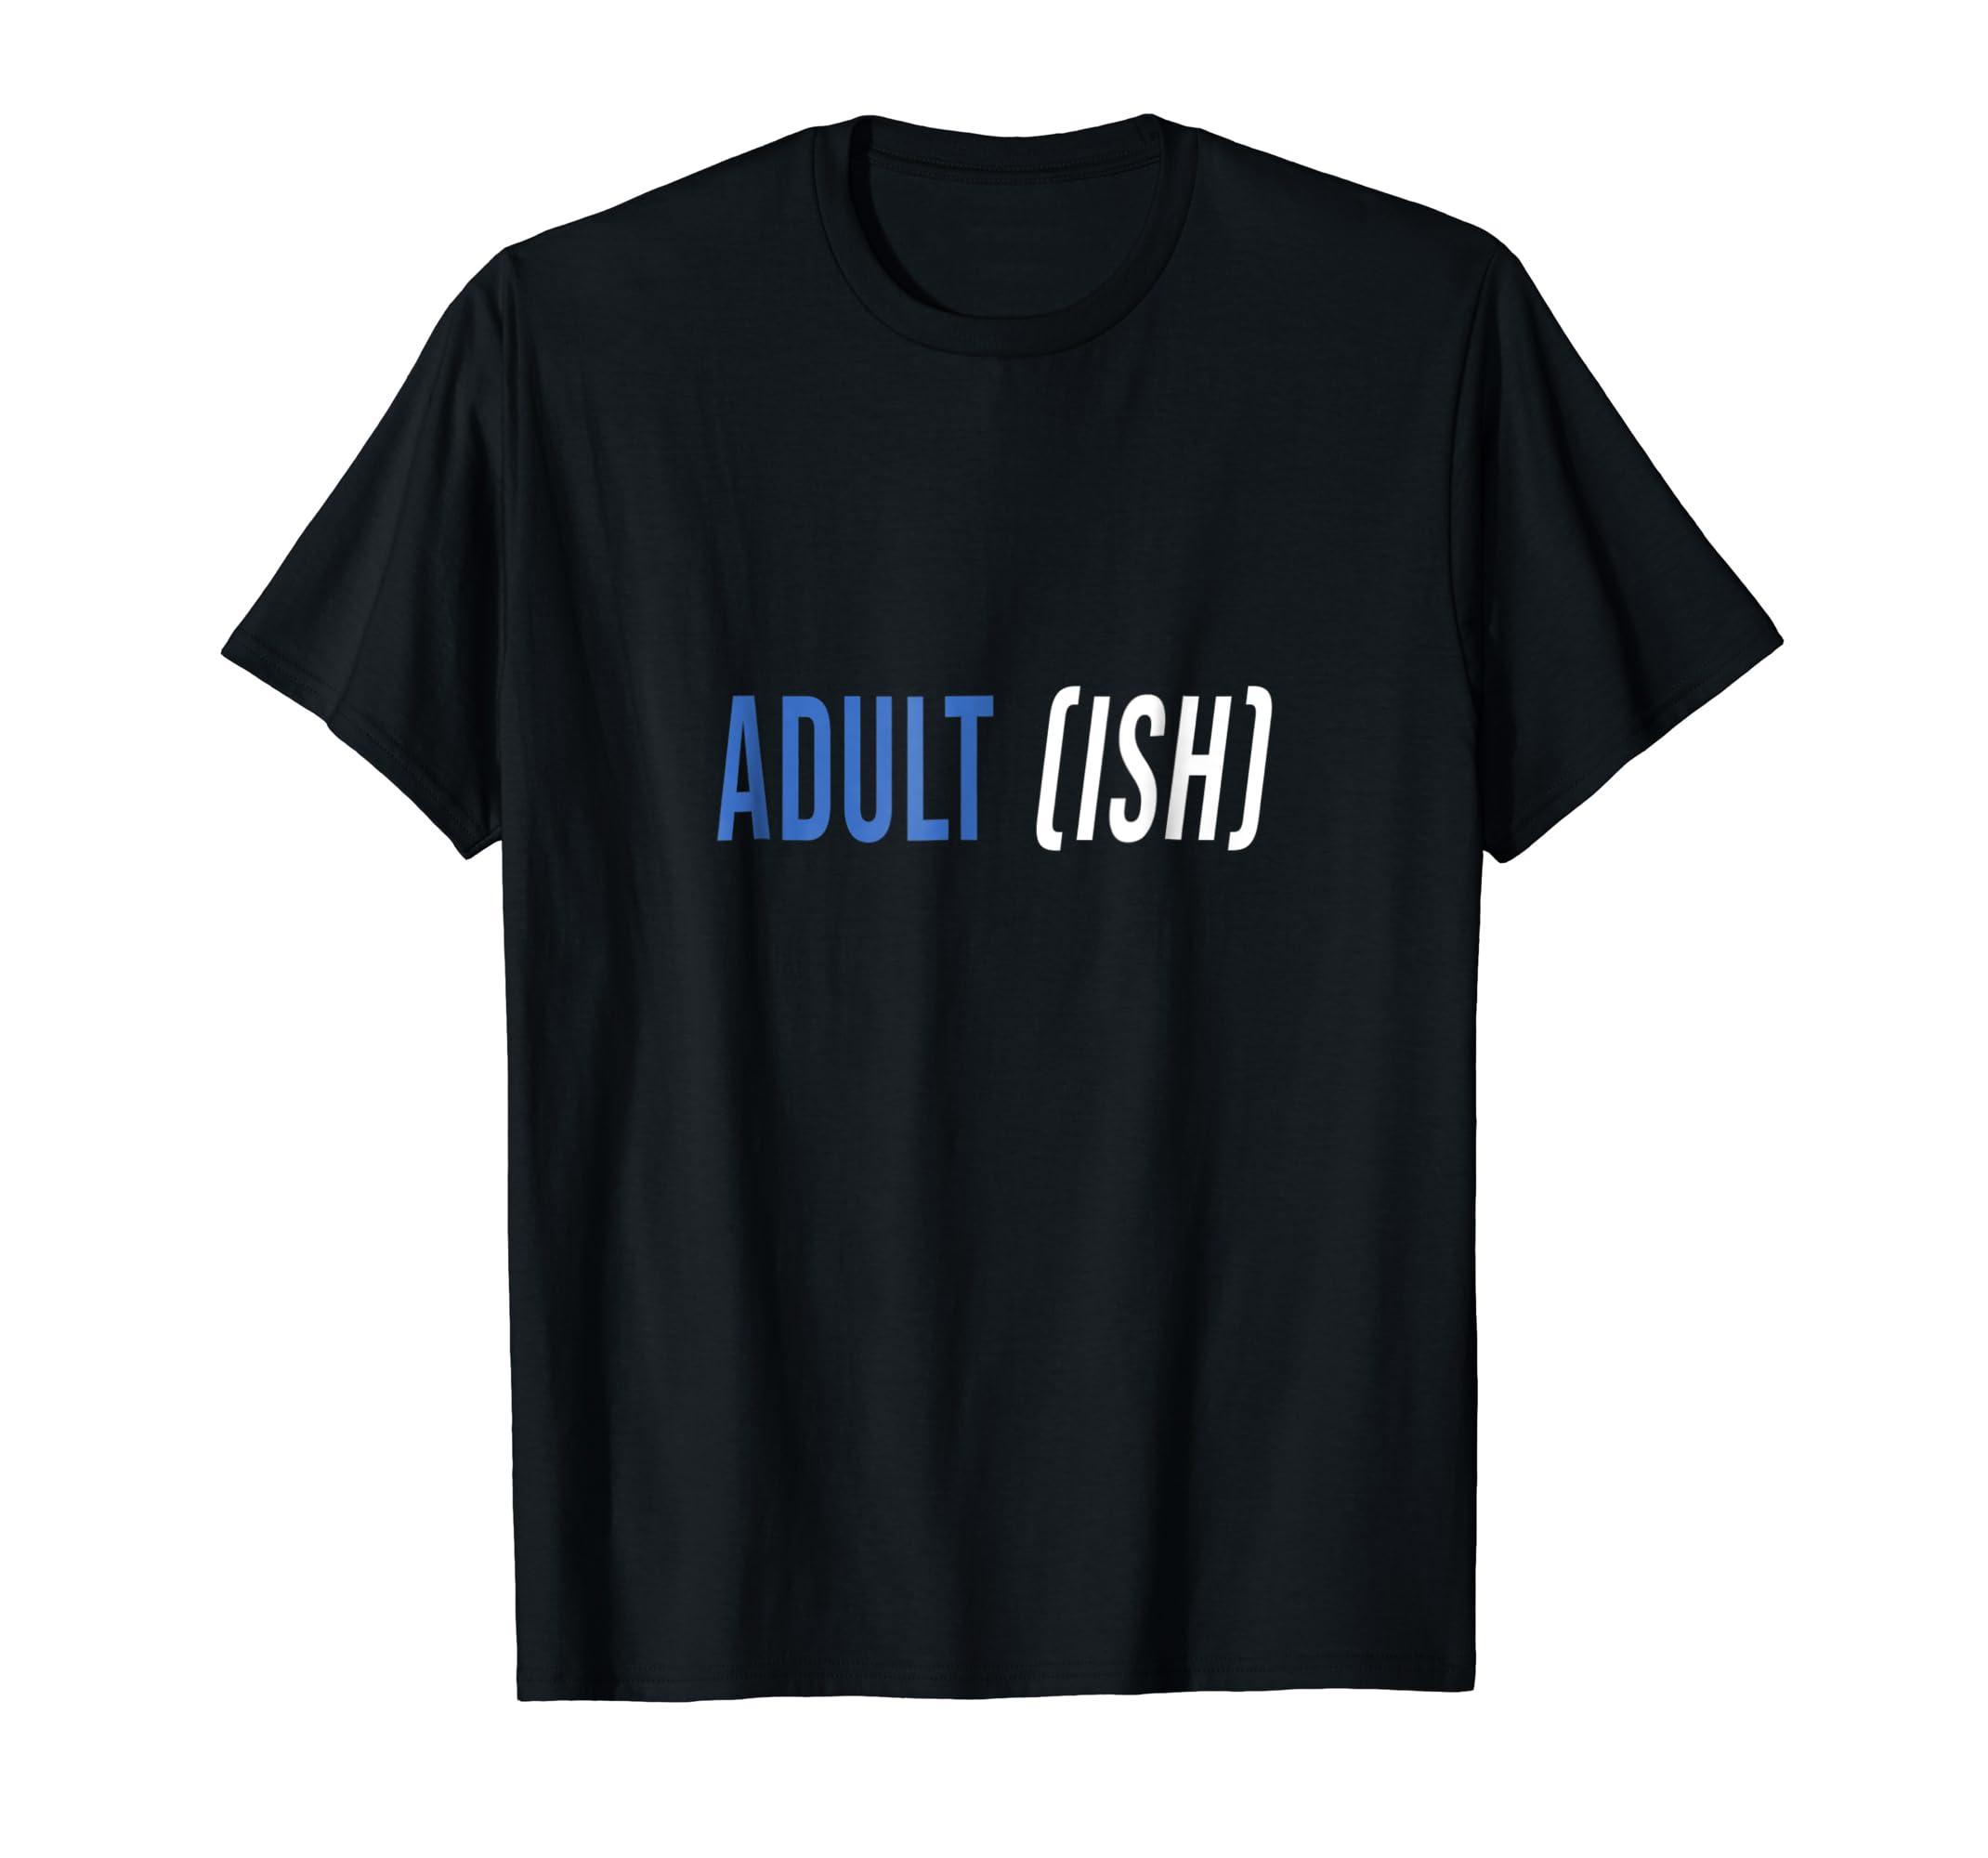 Funny Birthday Gift Shirt For 18 Year Old Boys And Girls Teechatpro